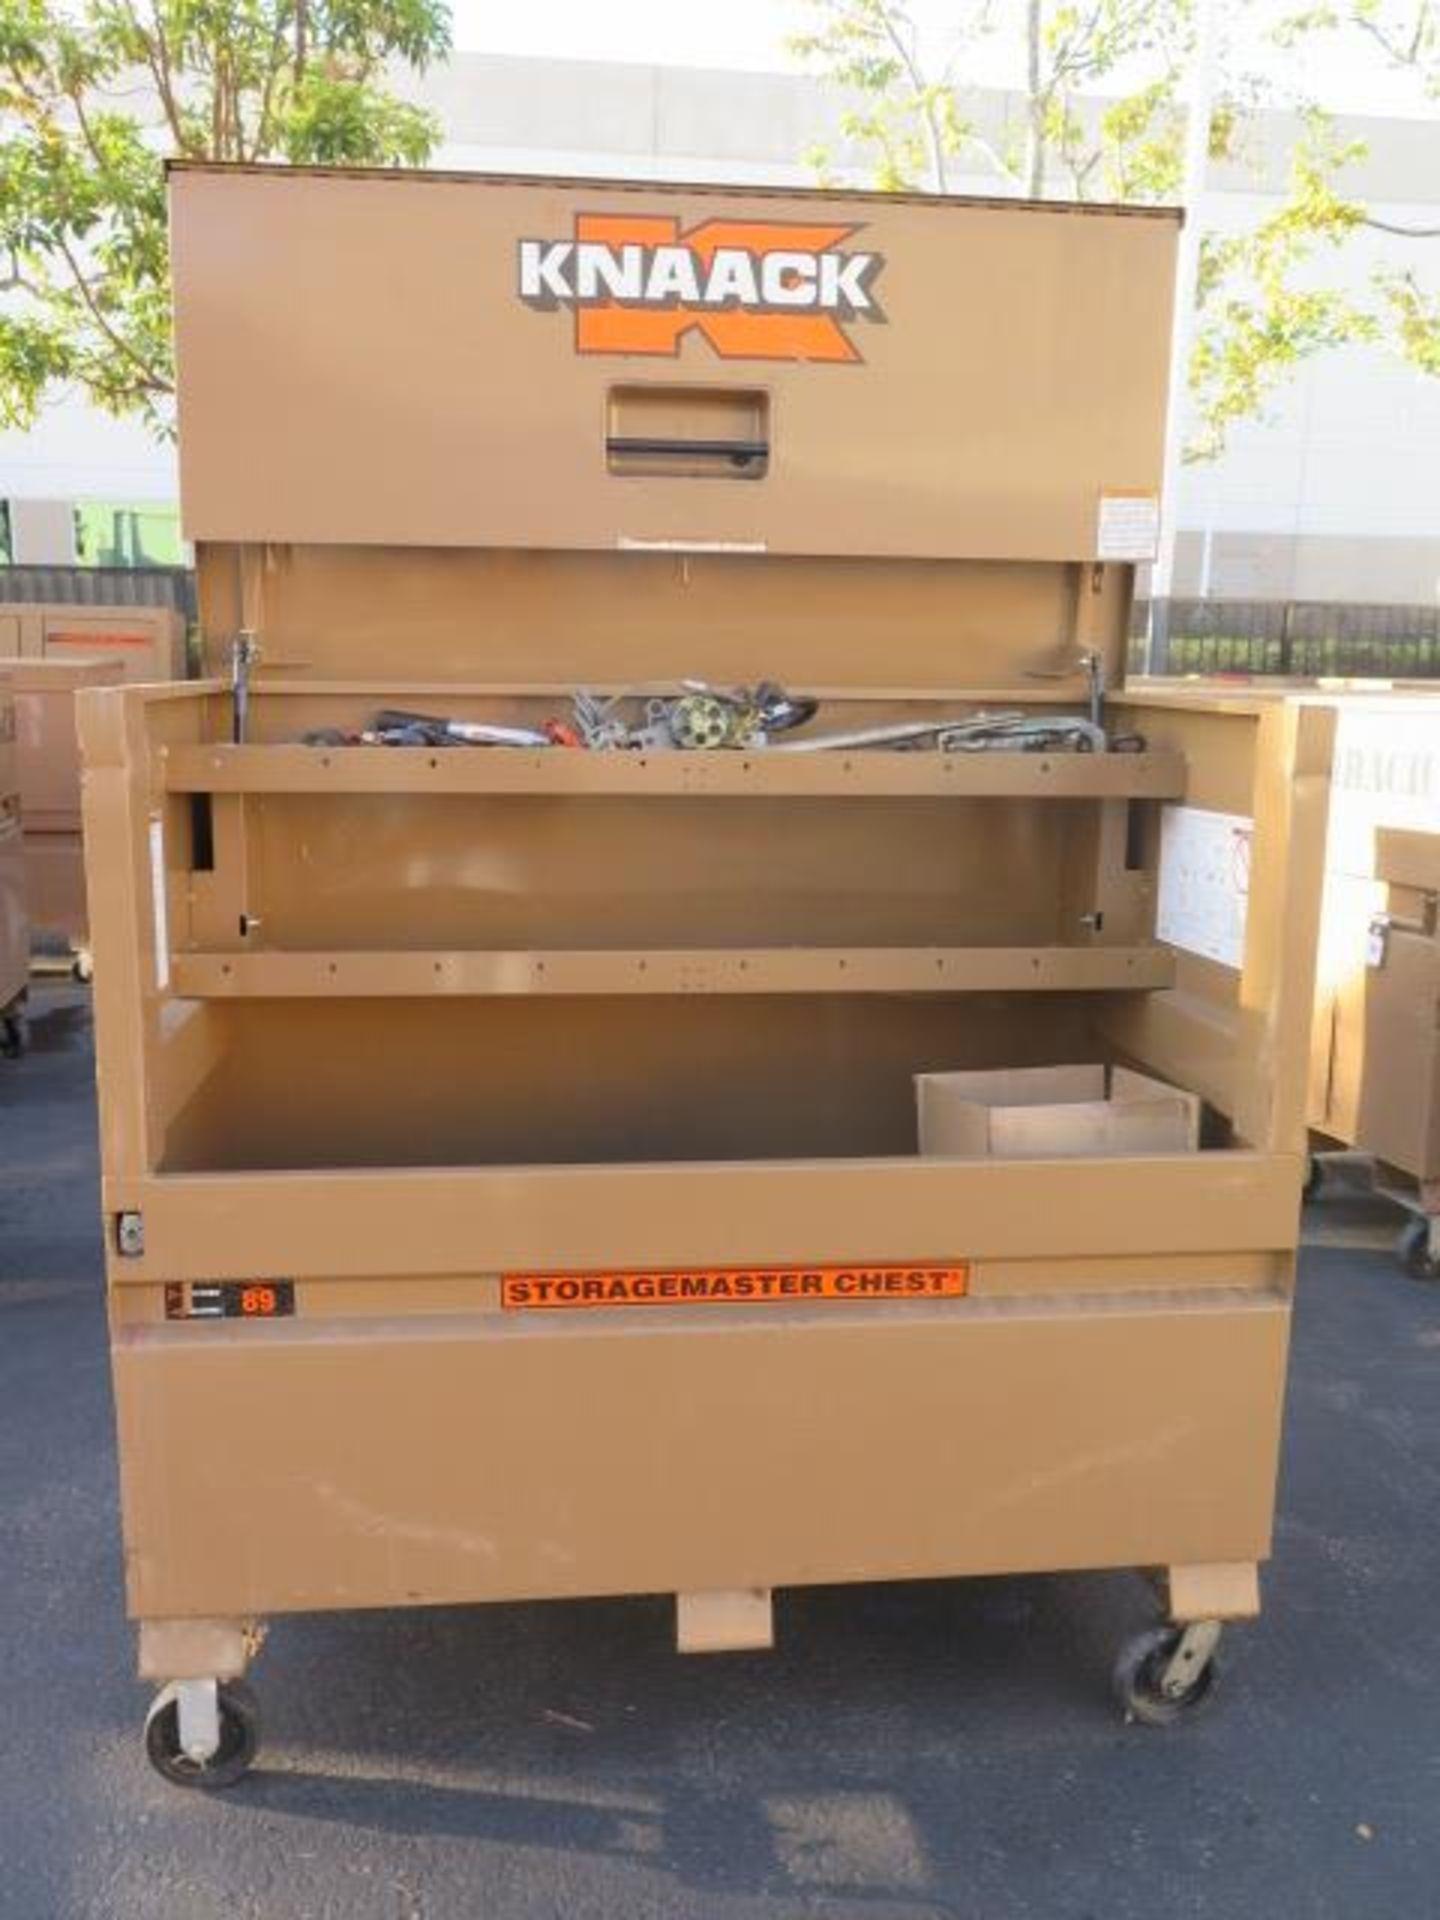 Knaack mdl. 89 Storagemaster Rolling Job Box w/ Come-Alongs (SOLD AS-IS - NO WARRANTY) - Image 4 of 12